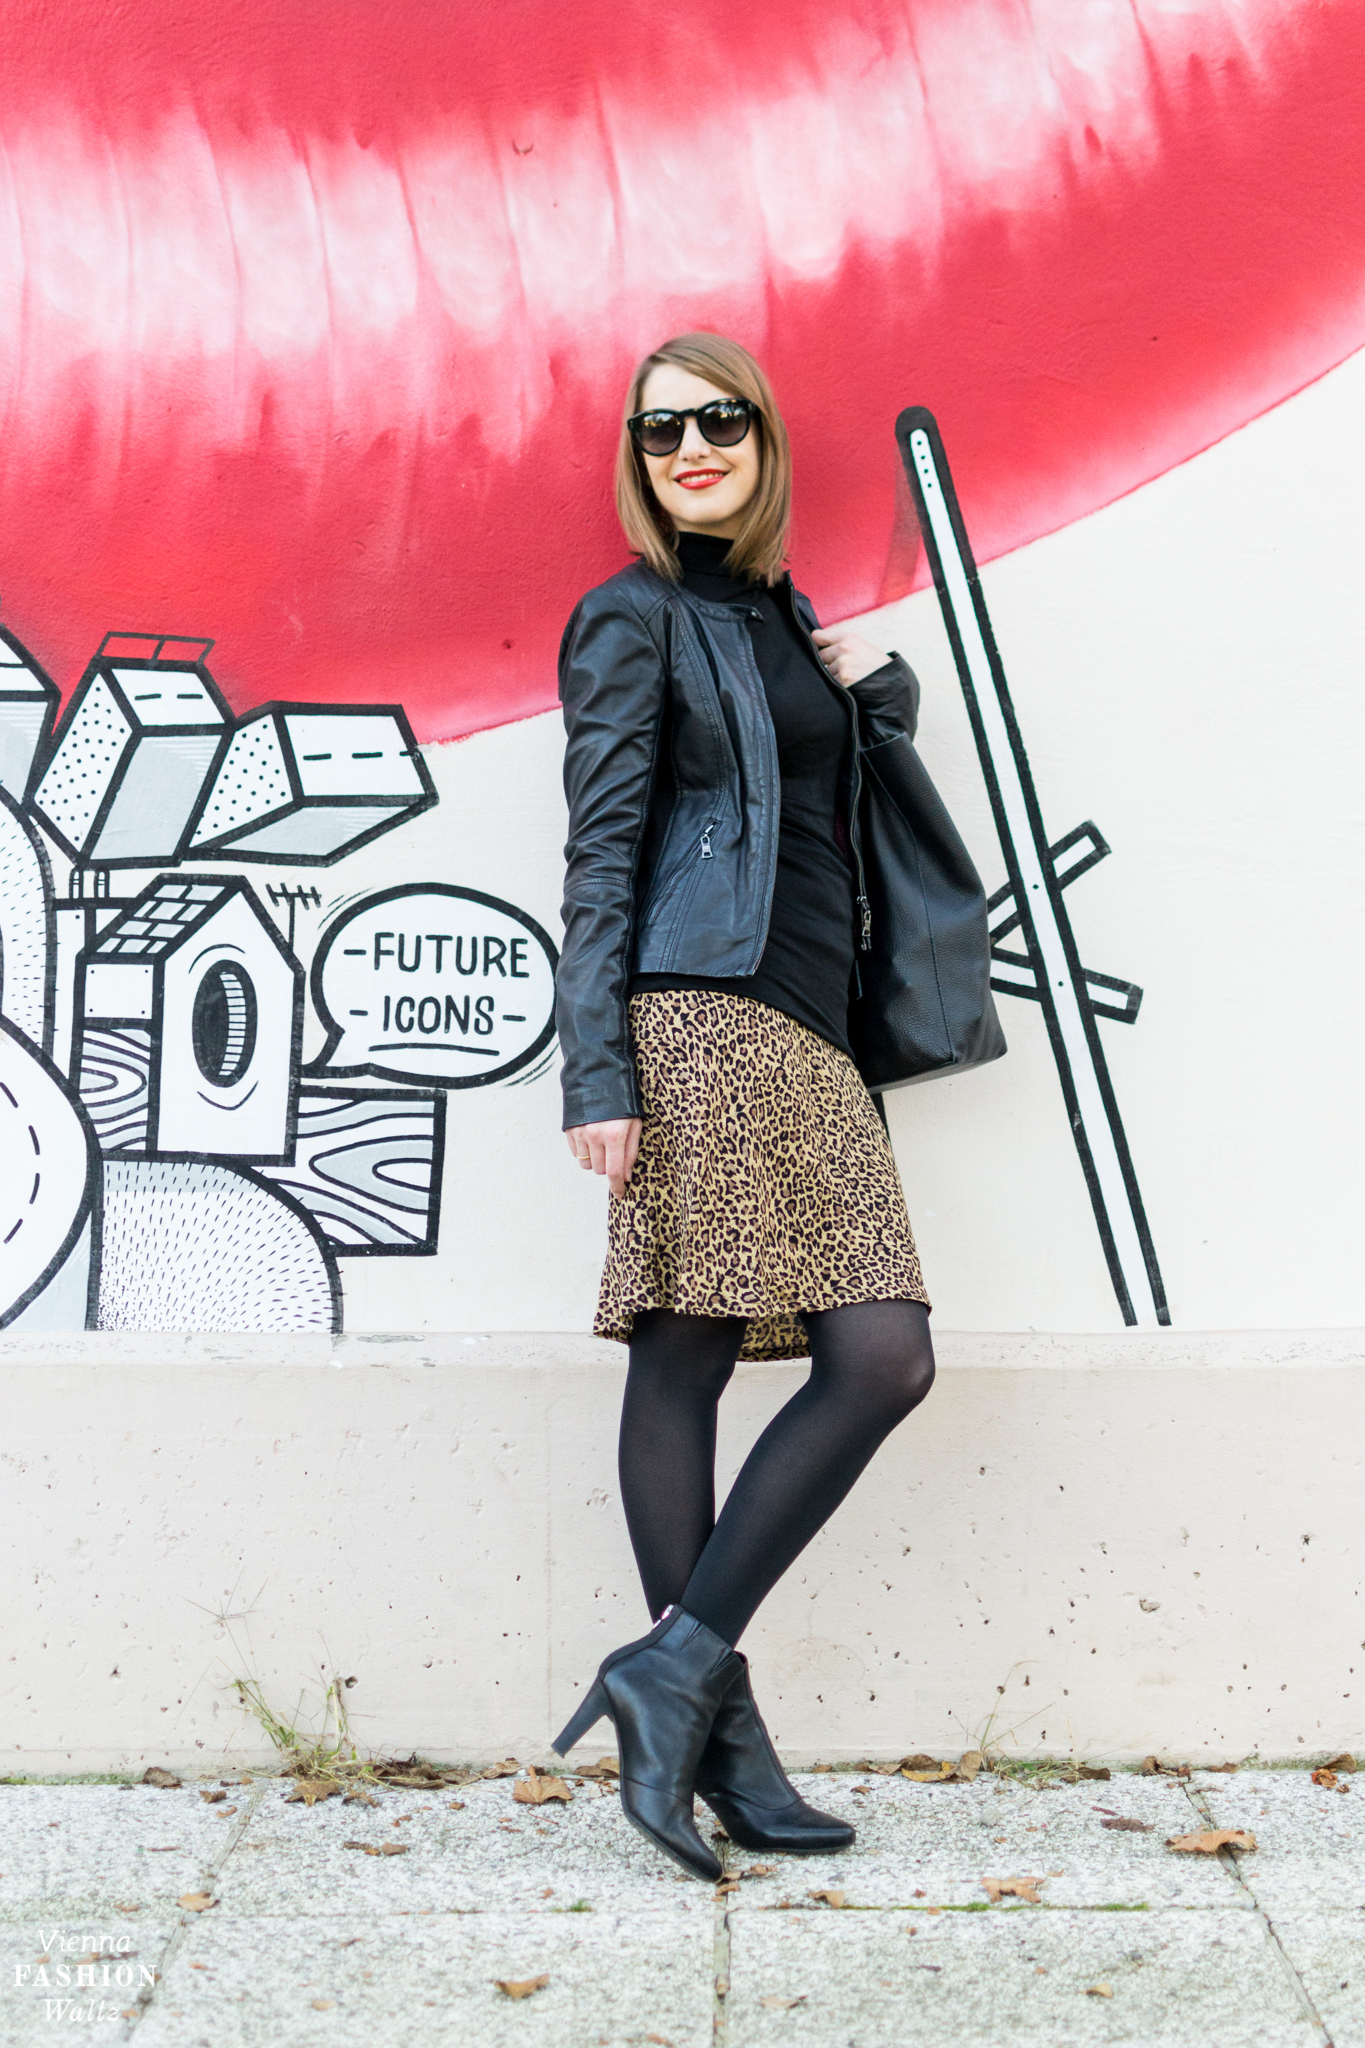 Fashion & Lifestyle Blog www.viennafashionwaltz.com Leoprint-Rock mit Lederjacke Leo Print Fashiontrend